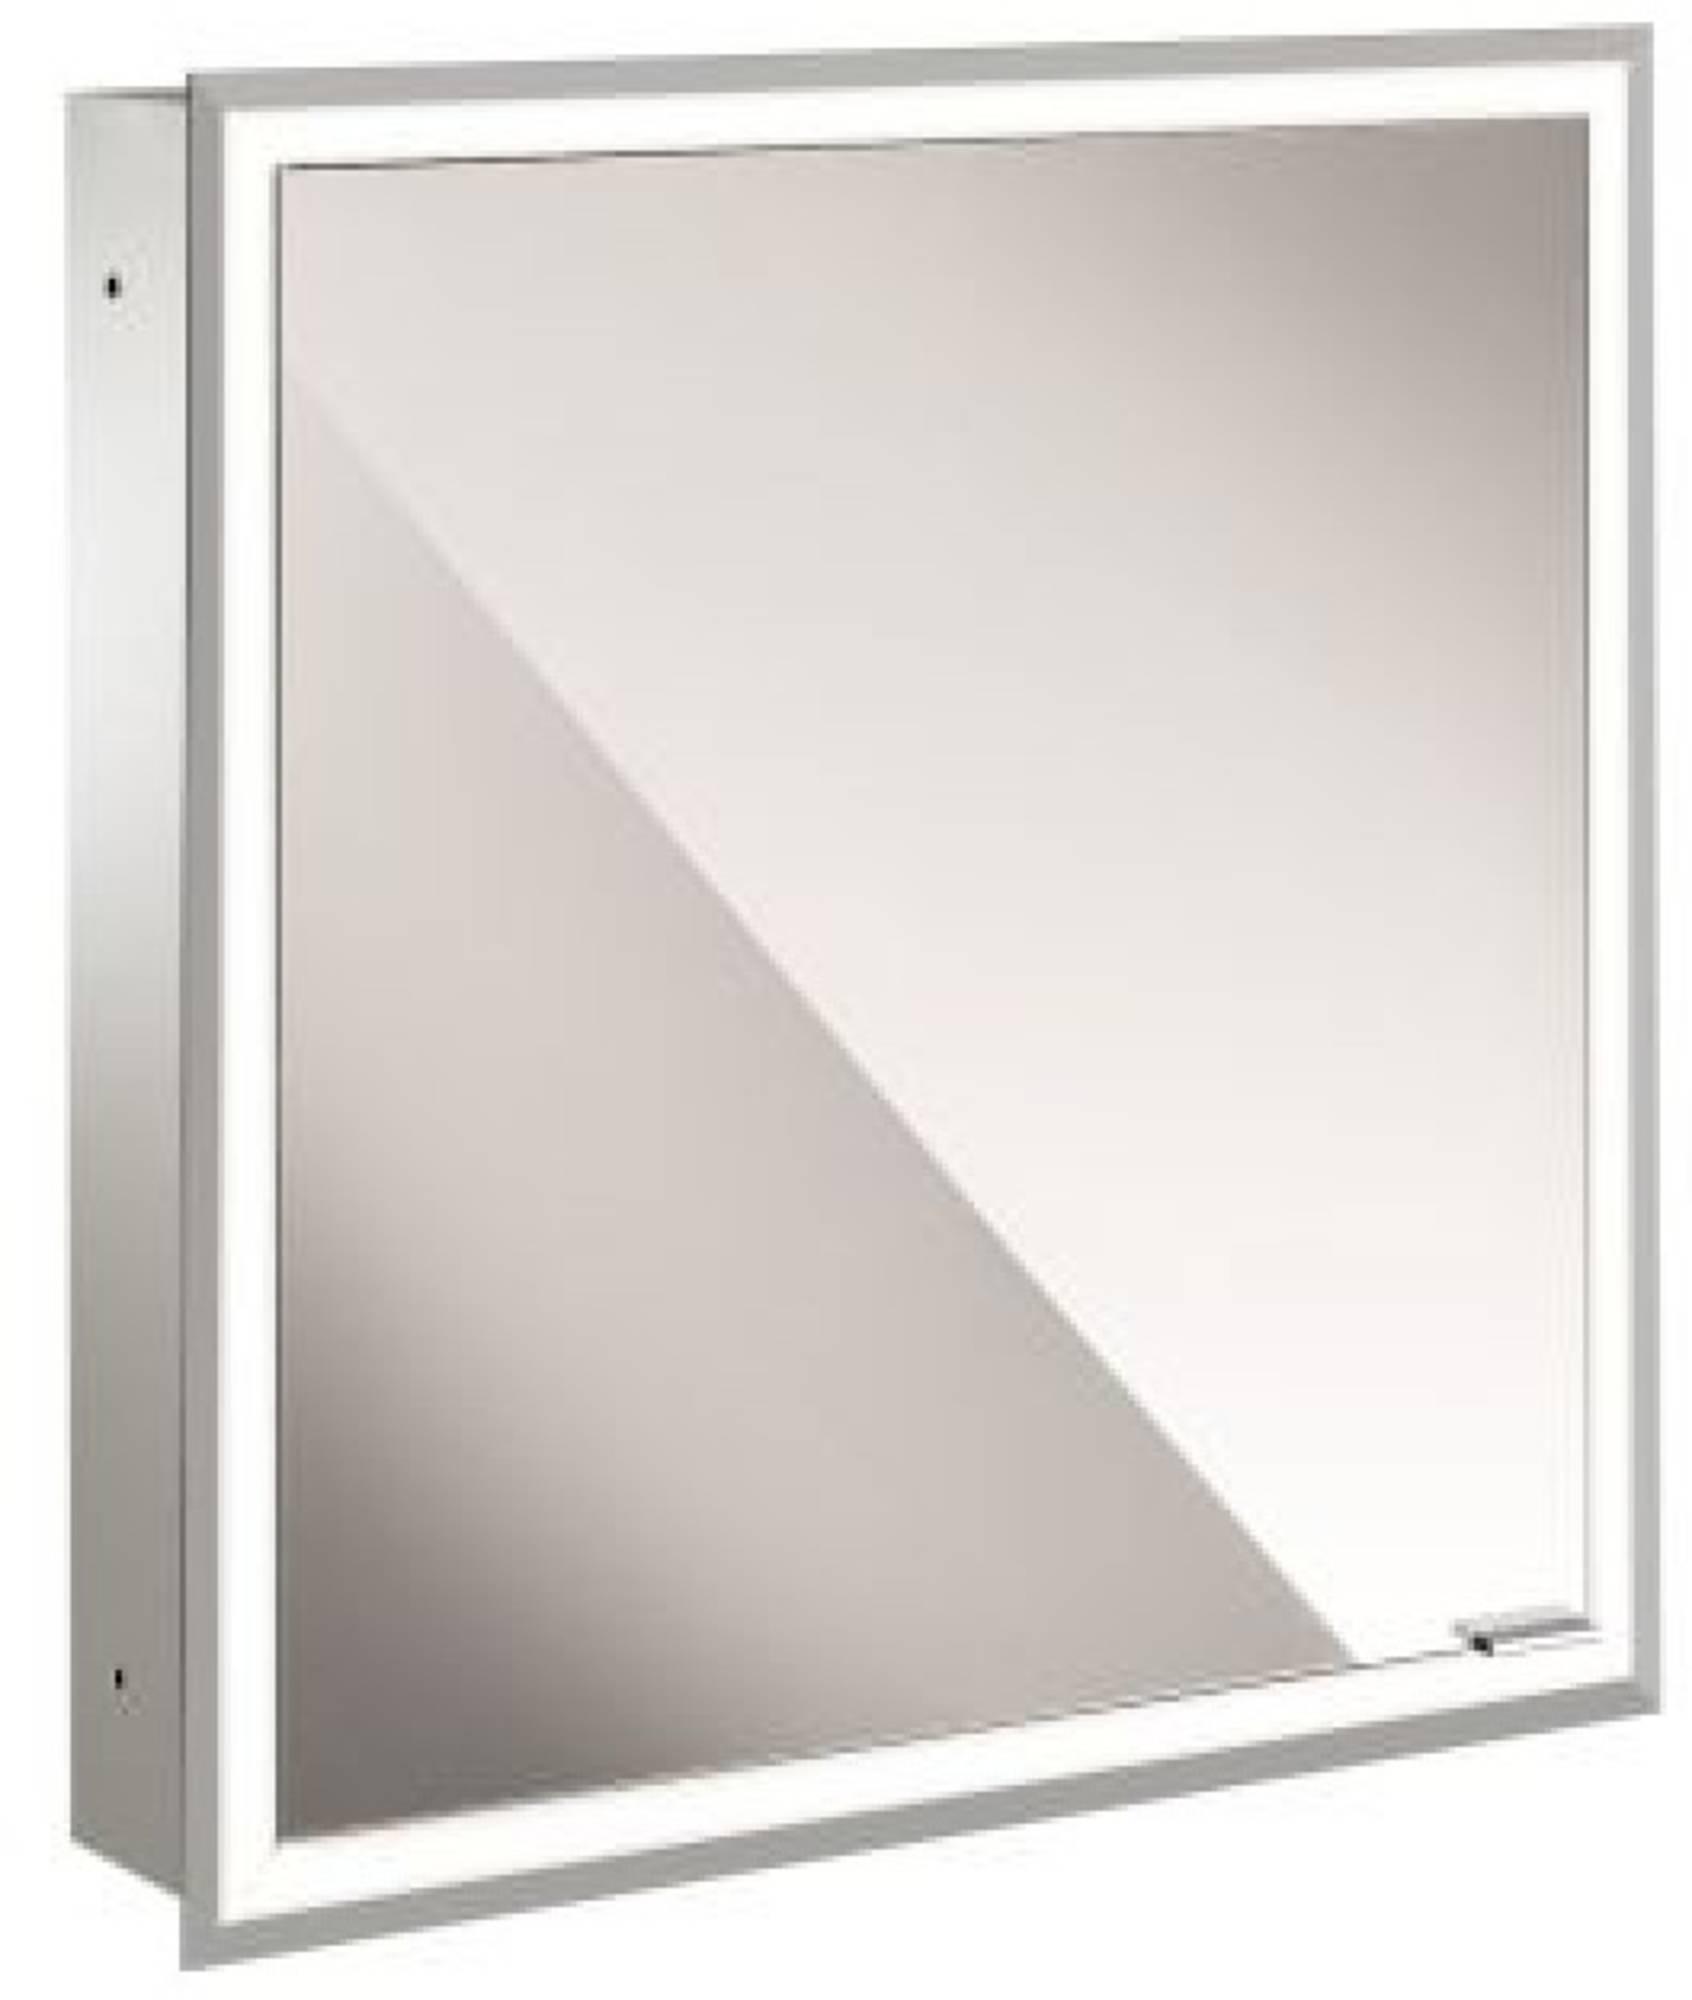 Emco Asis Prime inbouw spiegelkast 630x730 mm met led wit